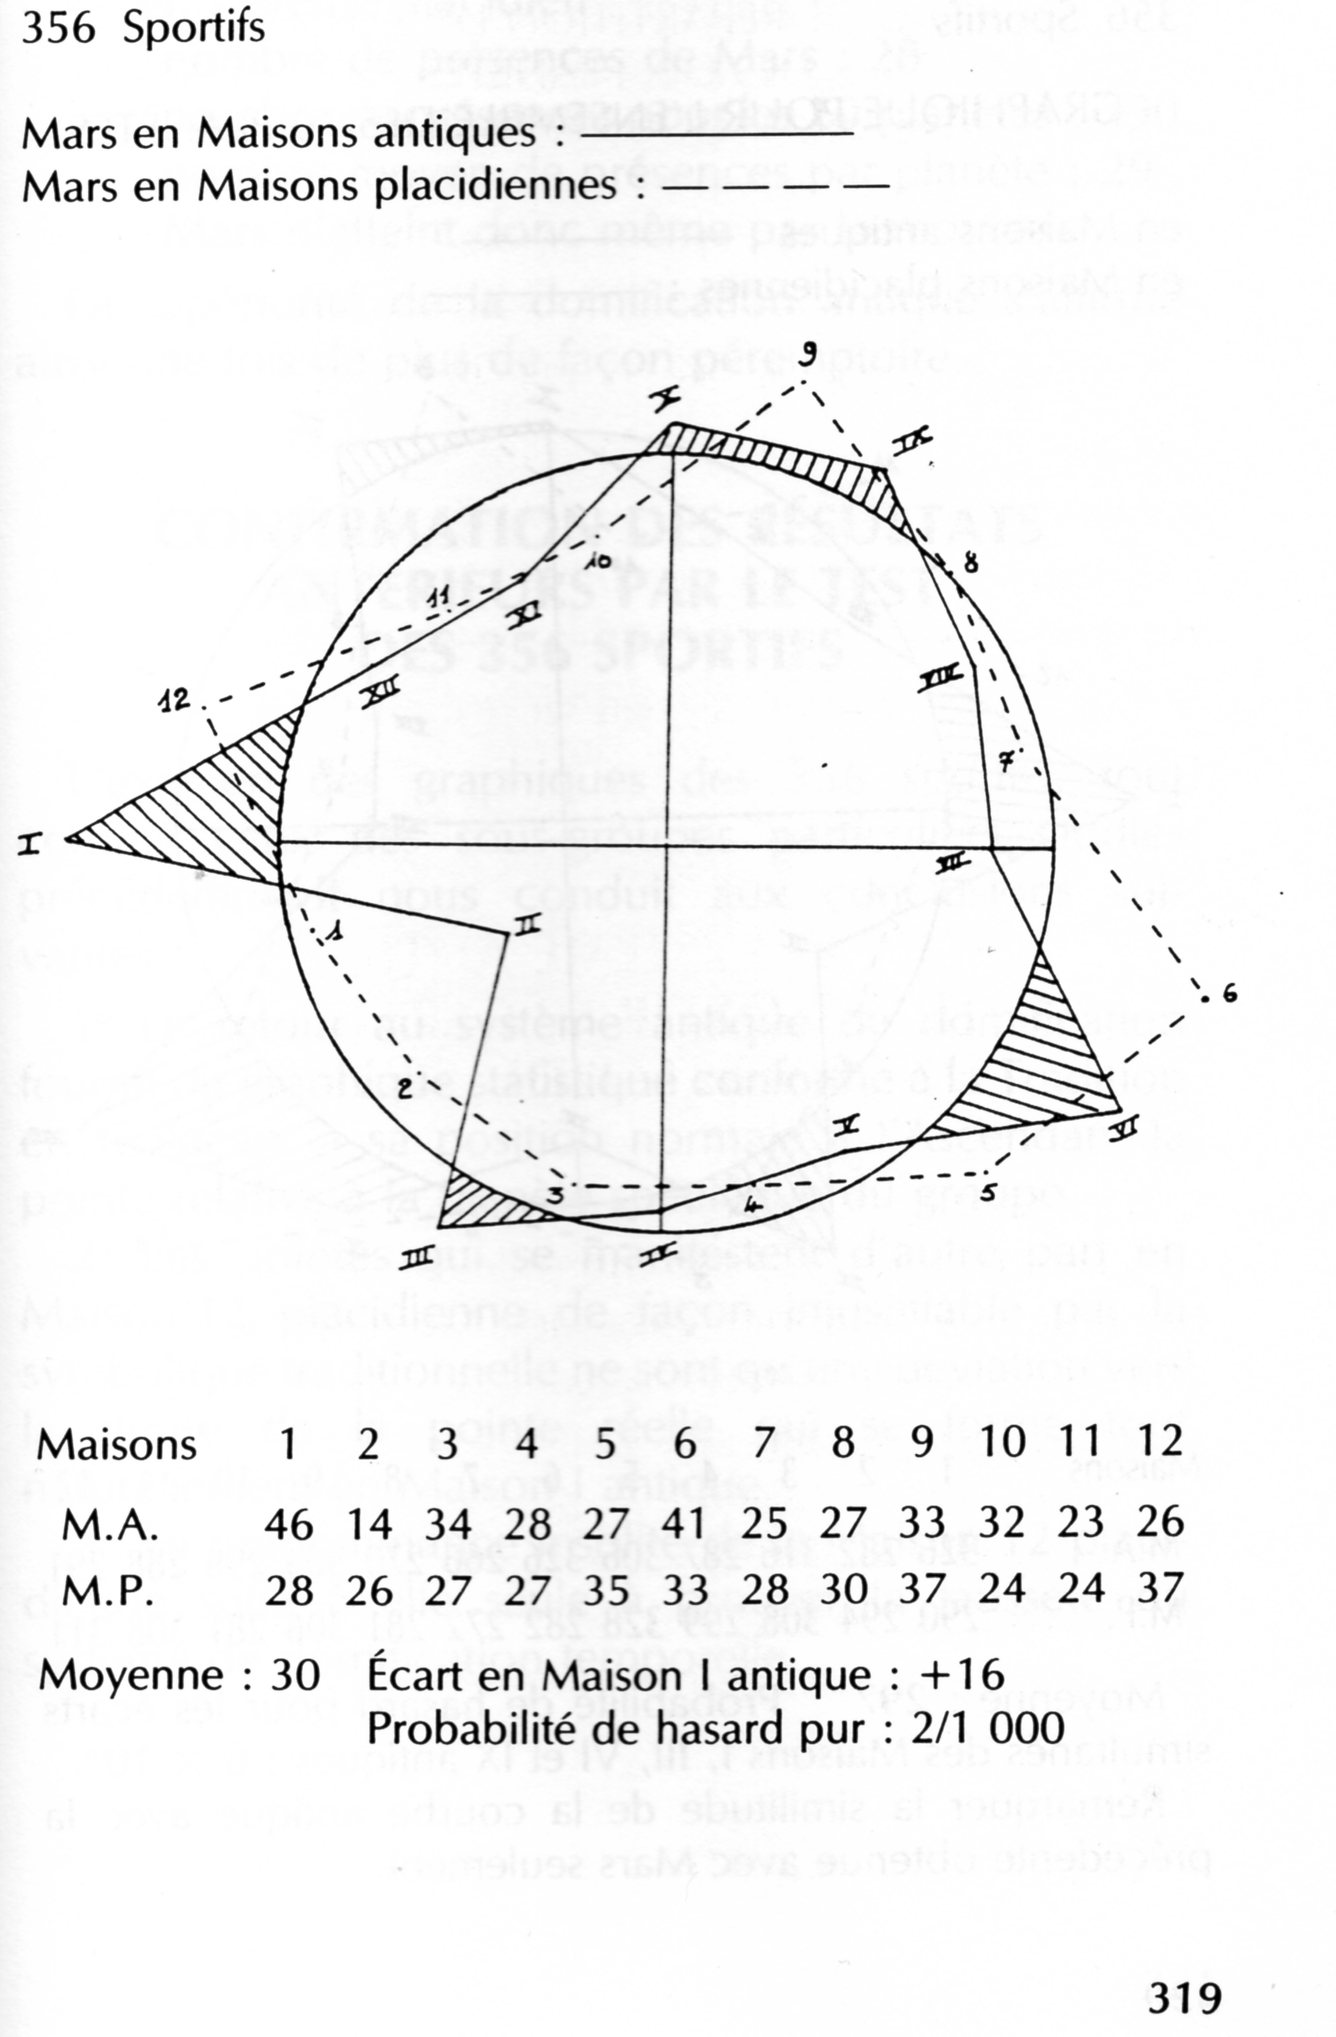 Le v ritable sens des maisons astrologie sid rale for Astrologie maison 5